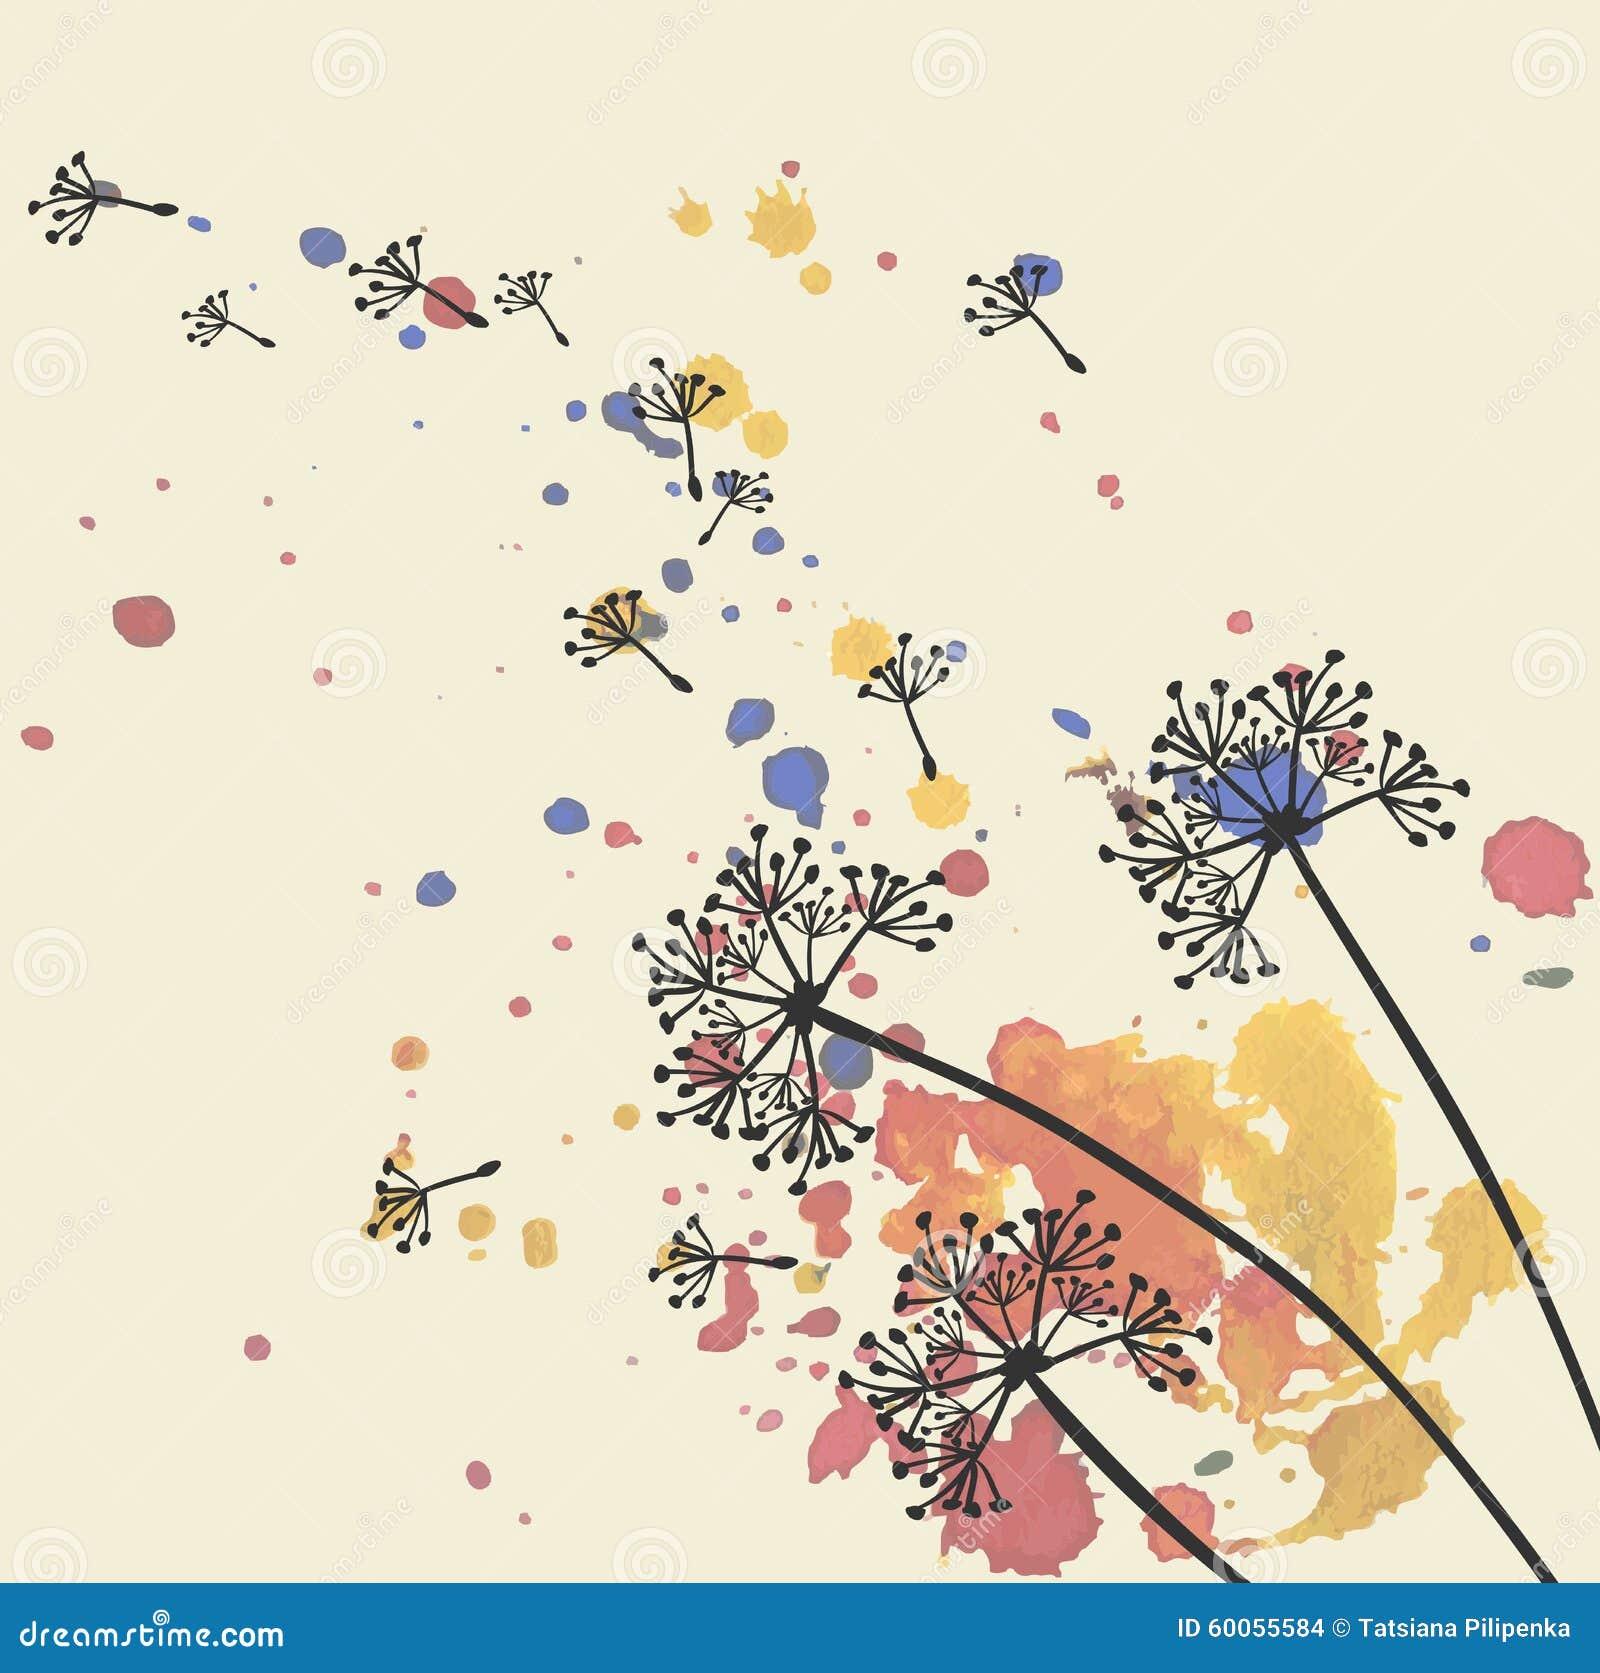 dandelion stock vector illustration of spring splash 60055584